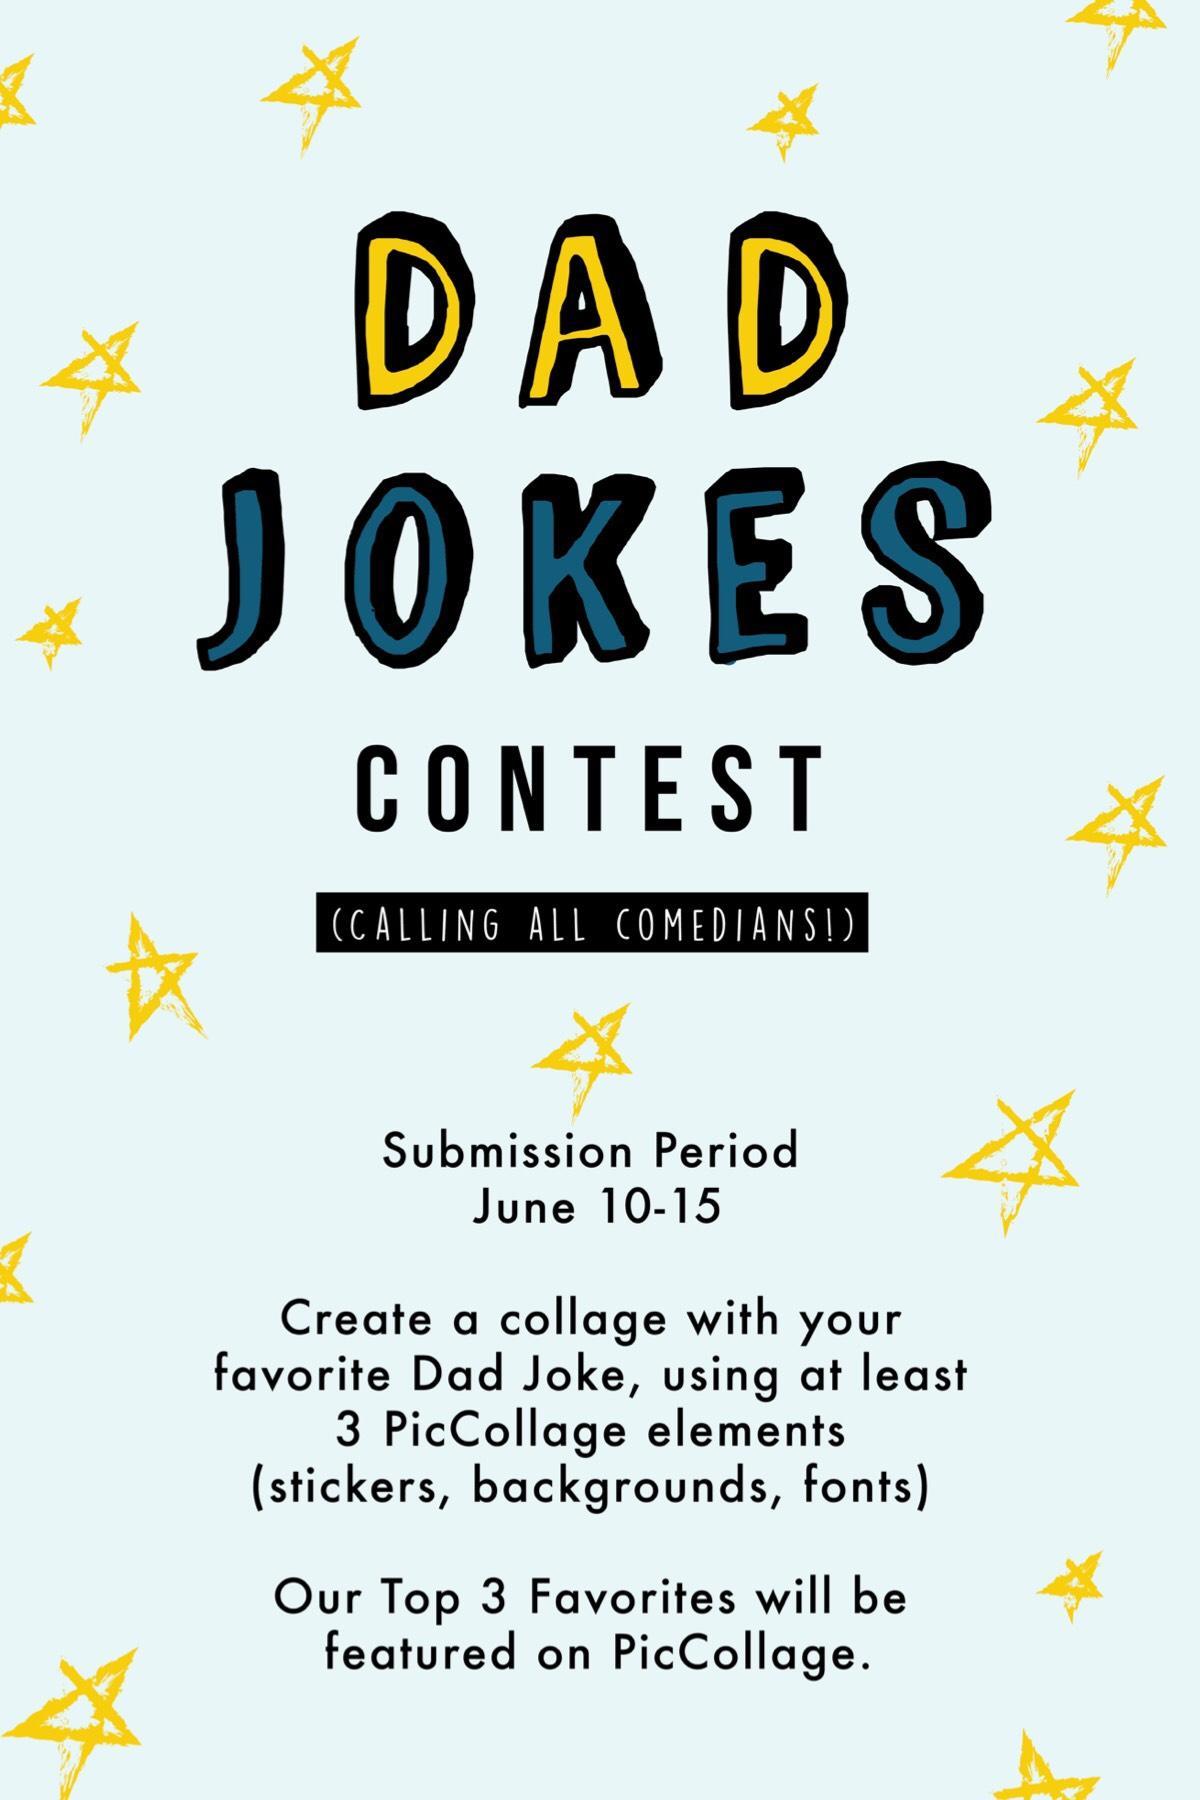 Tell us your favorite dad jokes! 🤣Deadline is June 15, 2019!